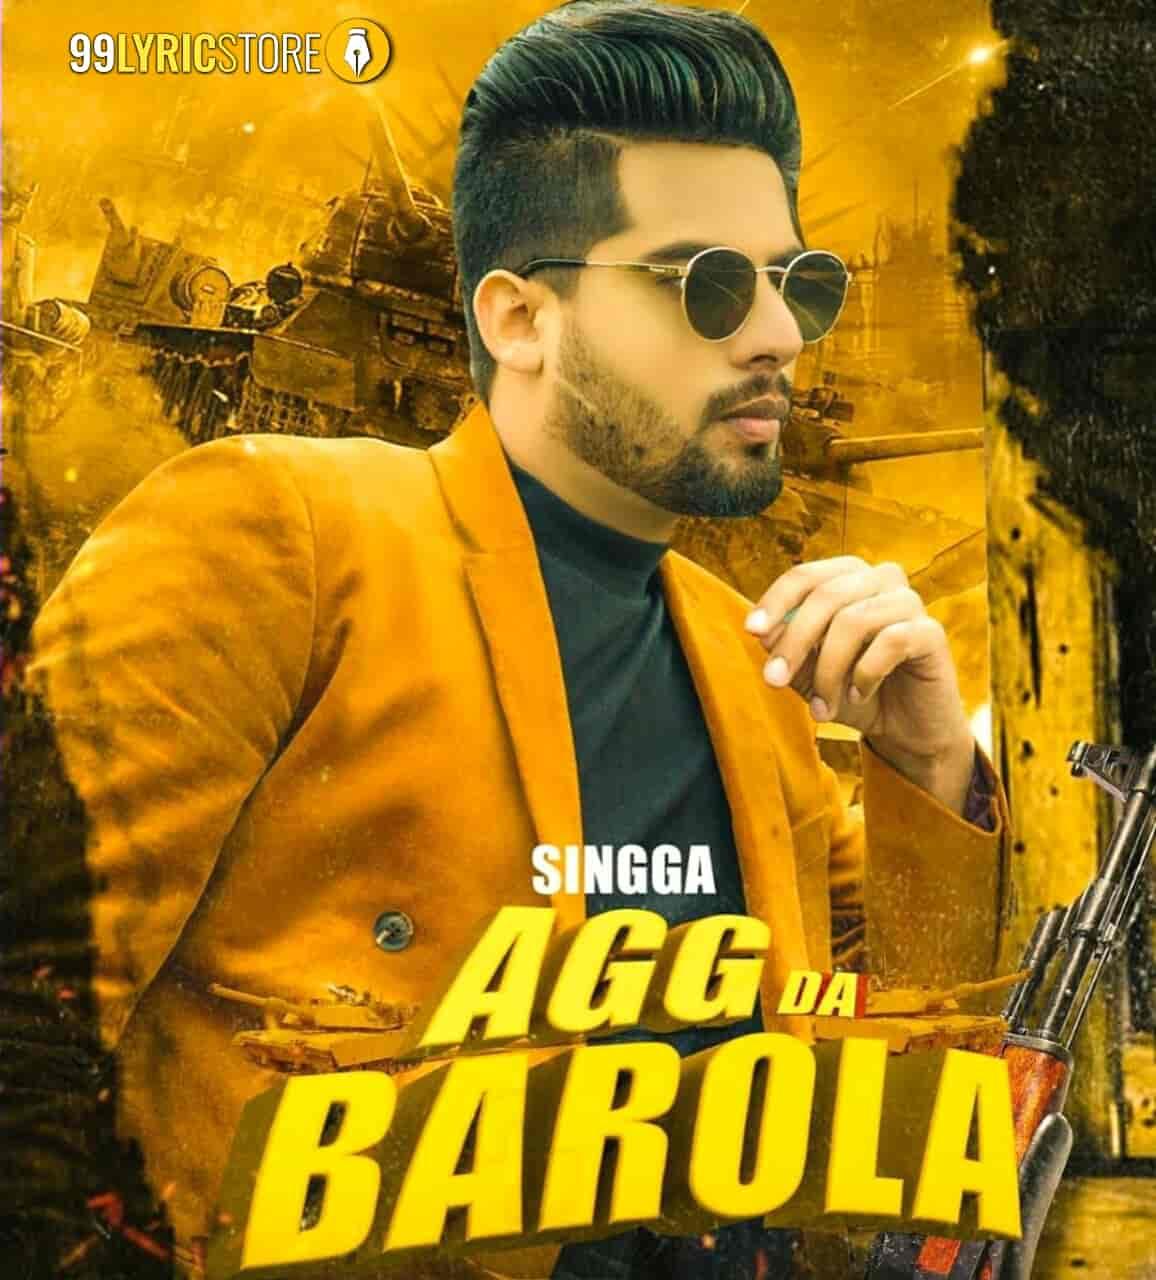 Agg Da Barola Punjabi Song Lyrics Images By Singga